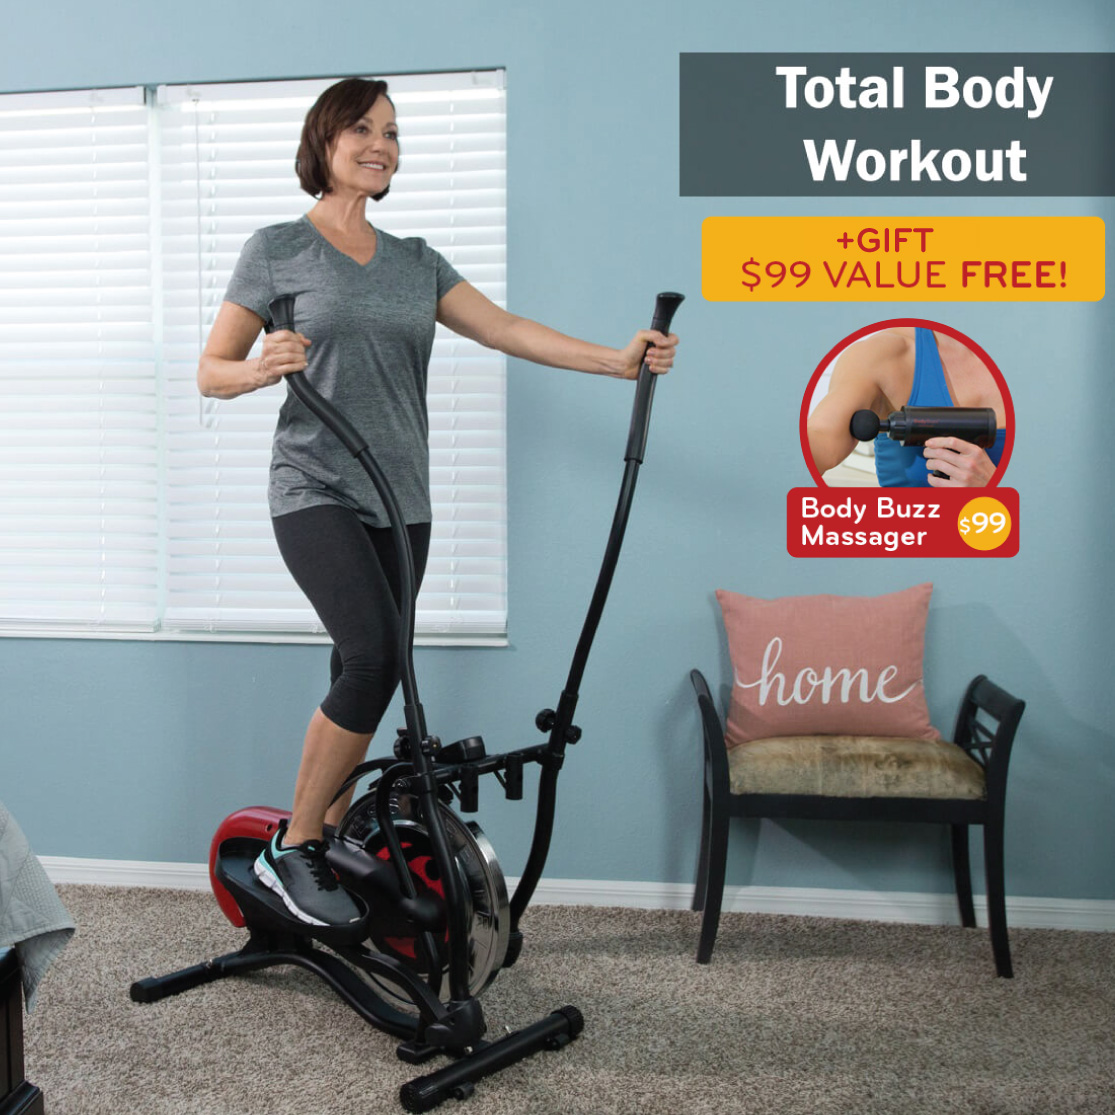 Total Body Workout on the Orbitrek Elite: Free Body Buzz Massager valued $99 (Gift)